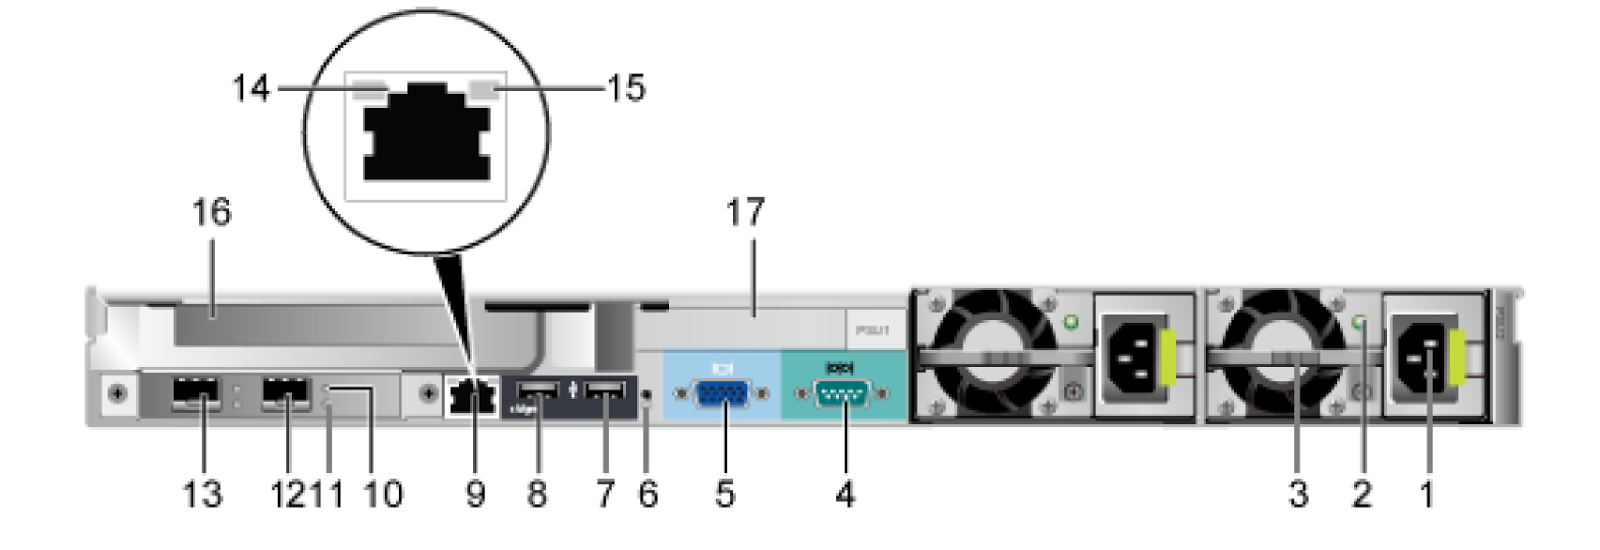 Платформа для хостинга от Huawei - 8